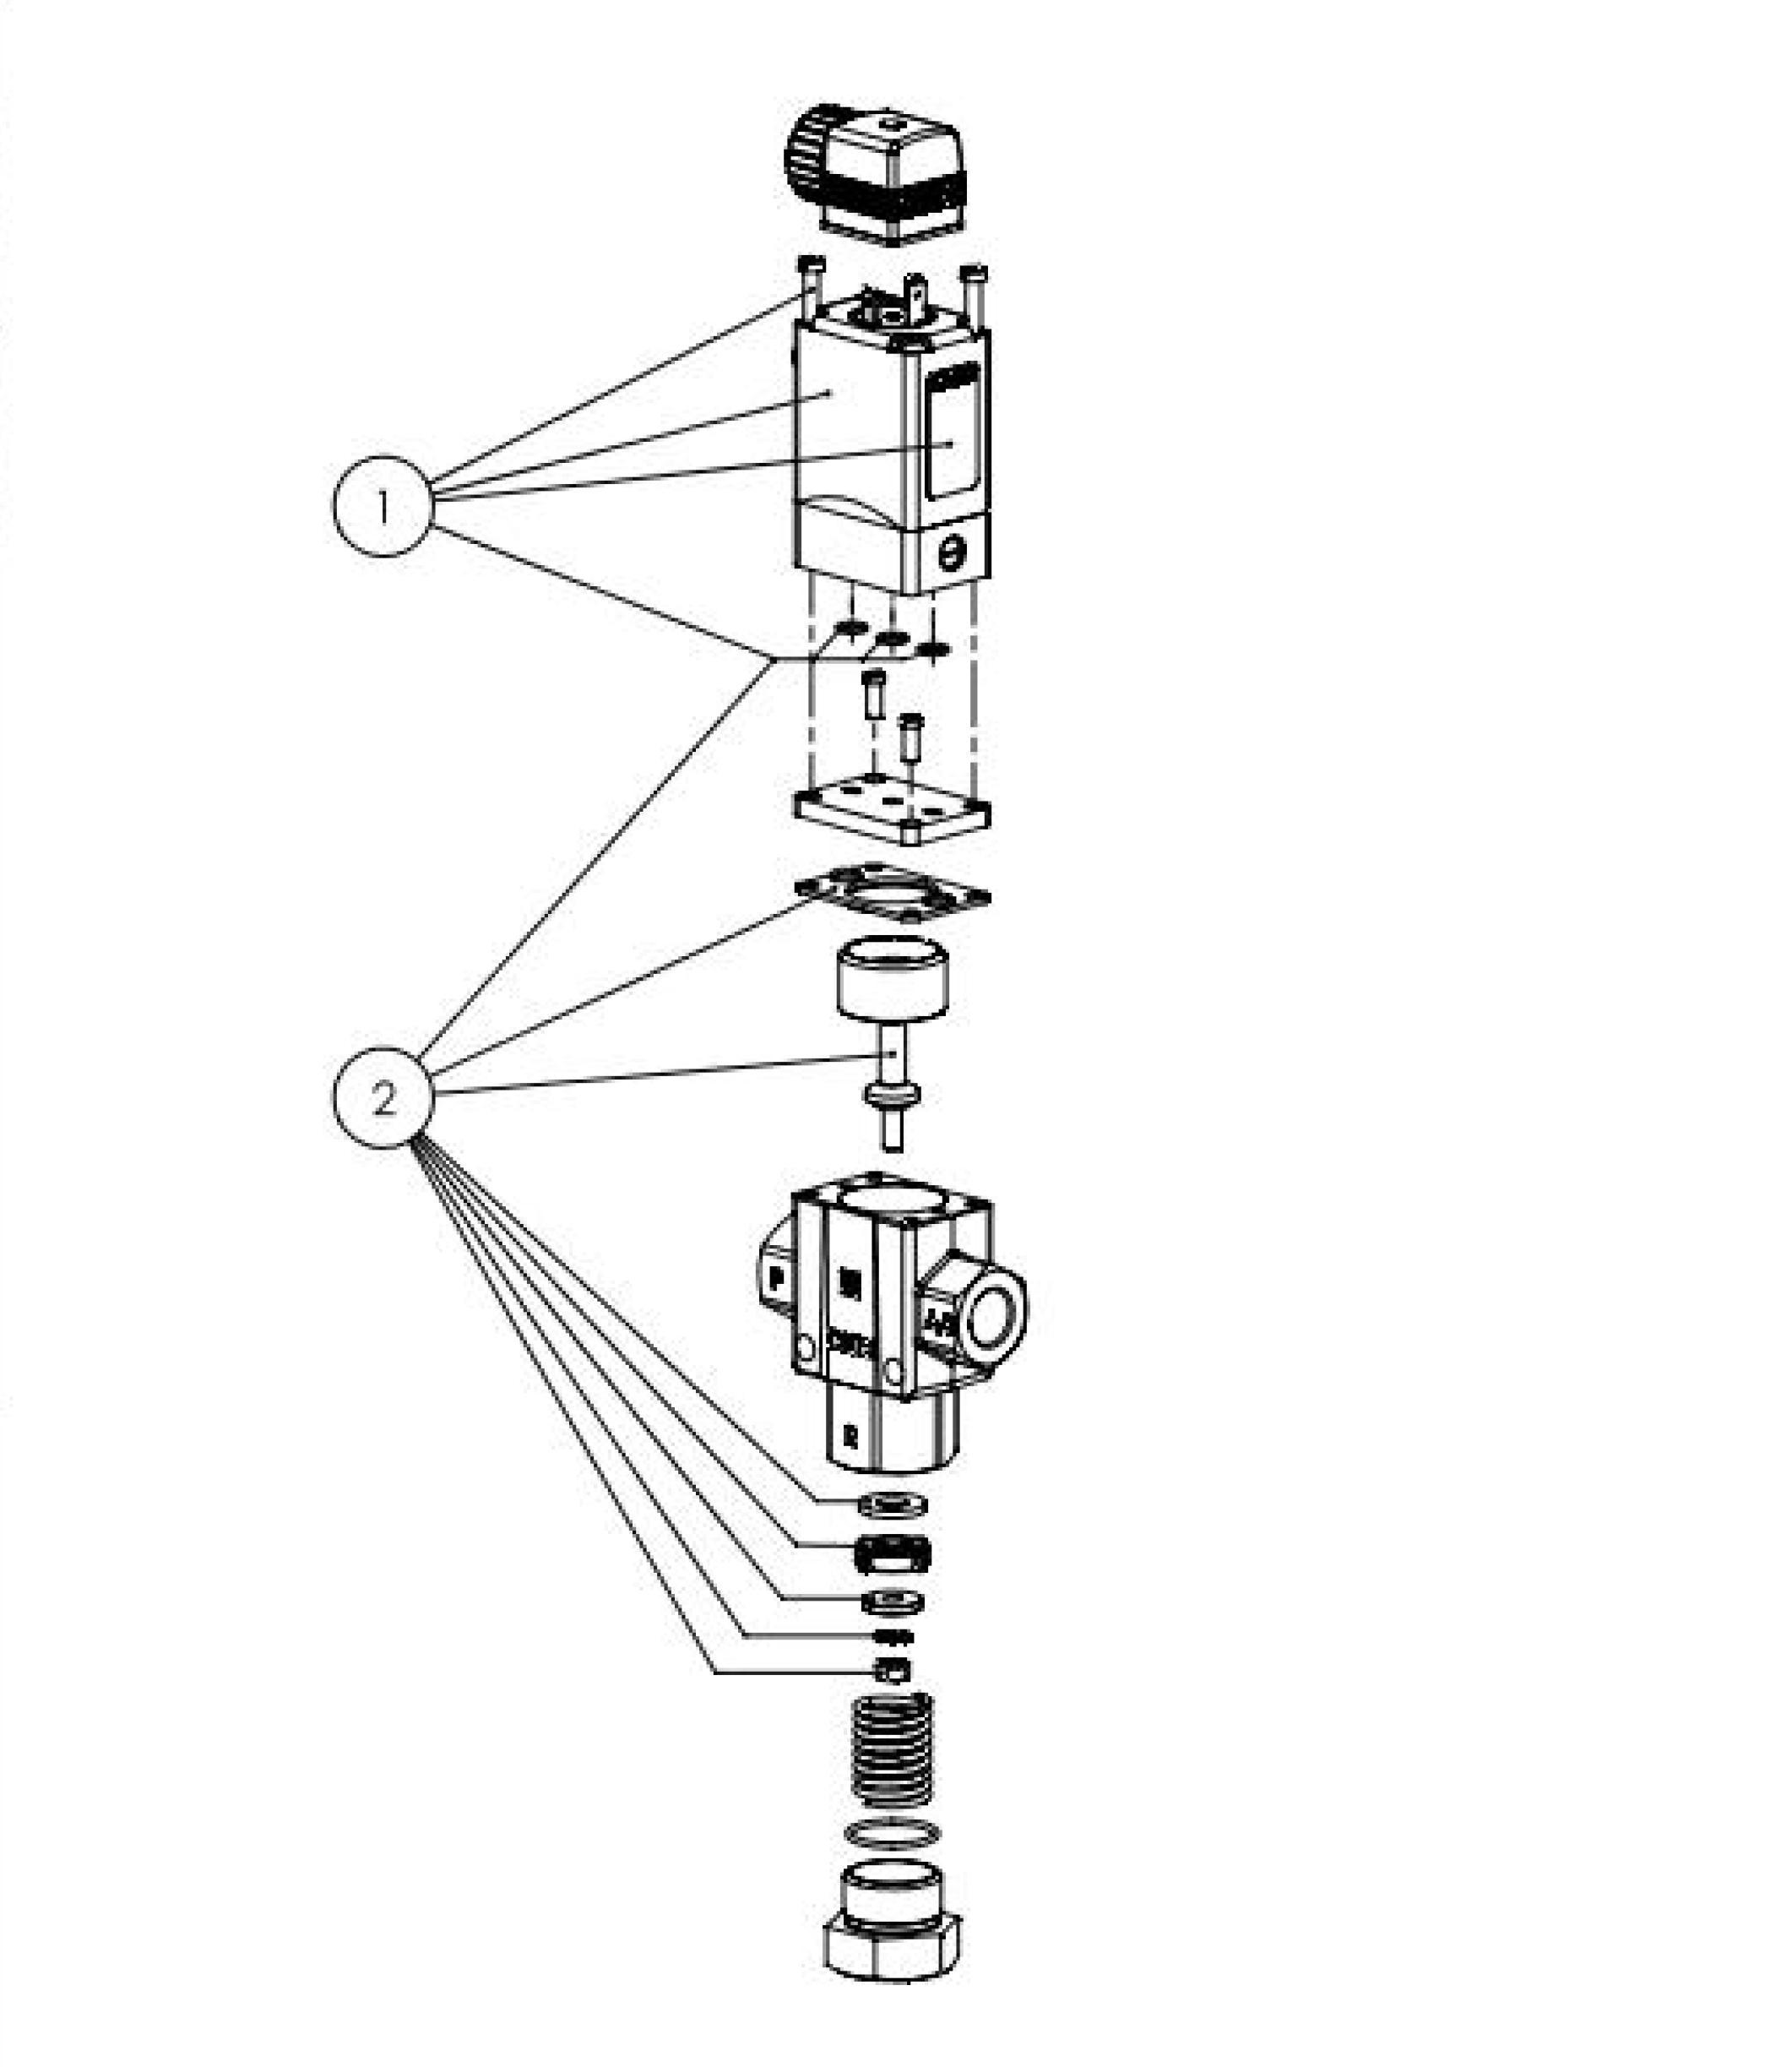 Typ 0343 - Servokolbenventil 3/2 Wege fremdgesteuert